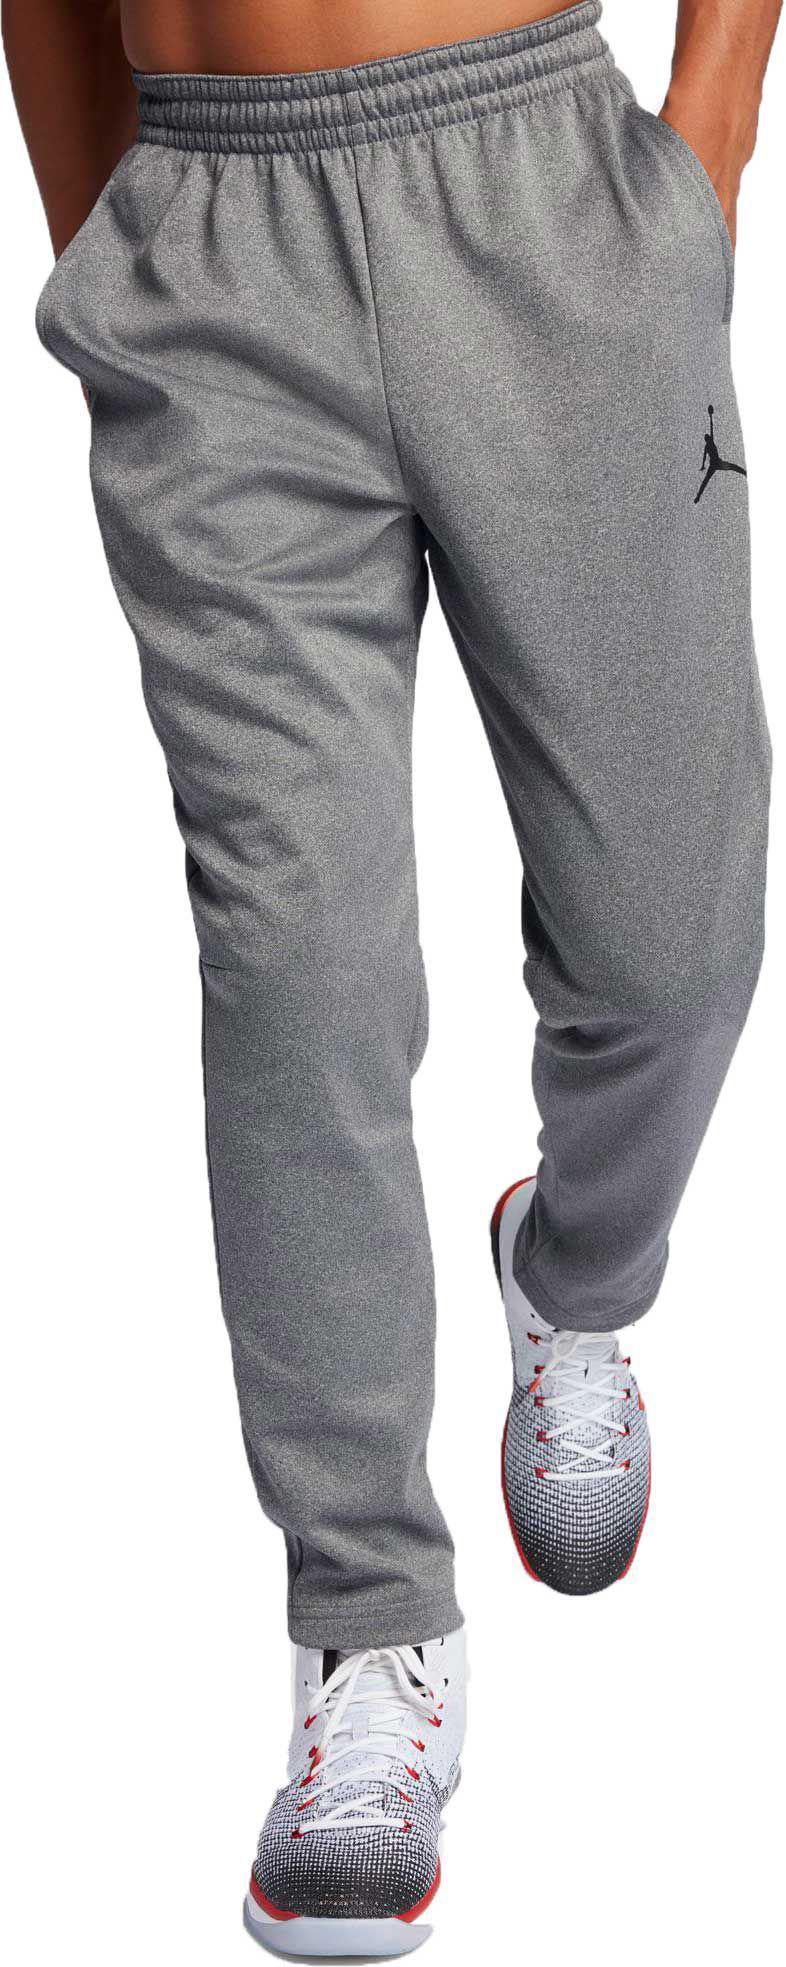 097a32bf82b8d6 Lyst - Nike Jordan Therma 23 Alpha Pants for Men